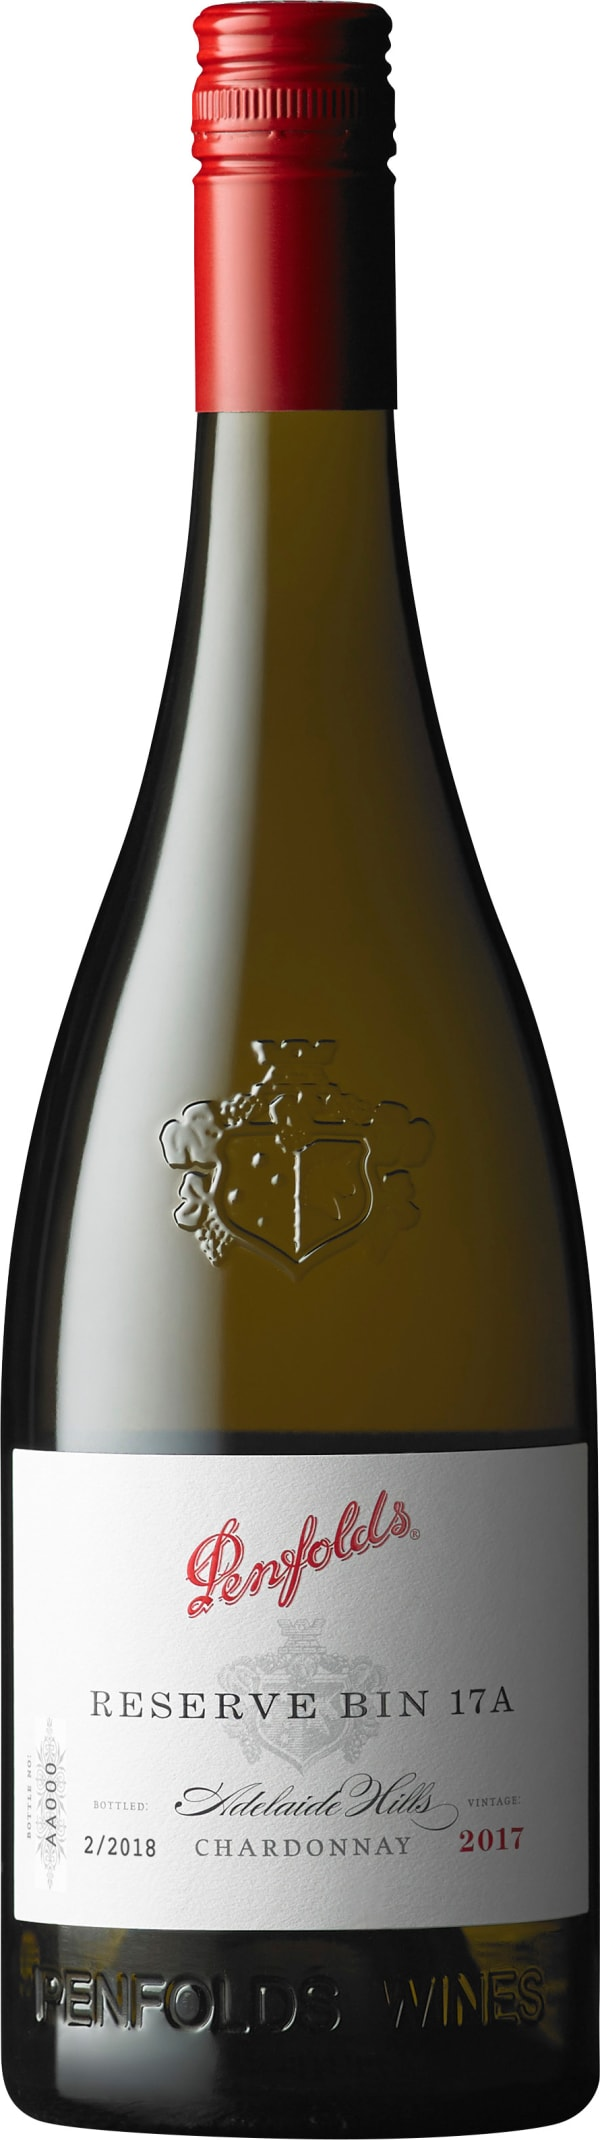 Penfolds Adelaide Hills Chardonnay Reserve Bin 17A 2017